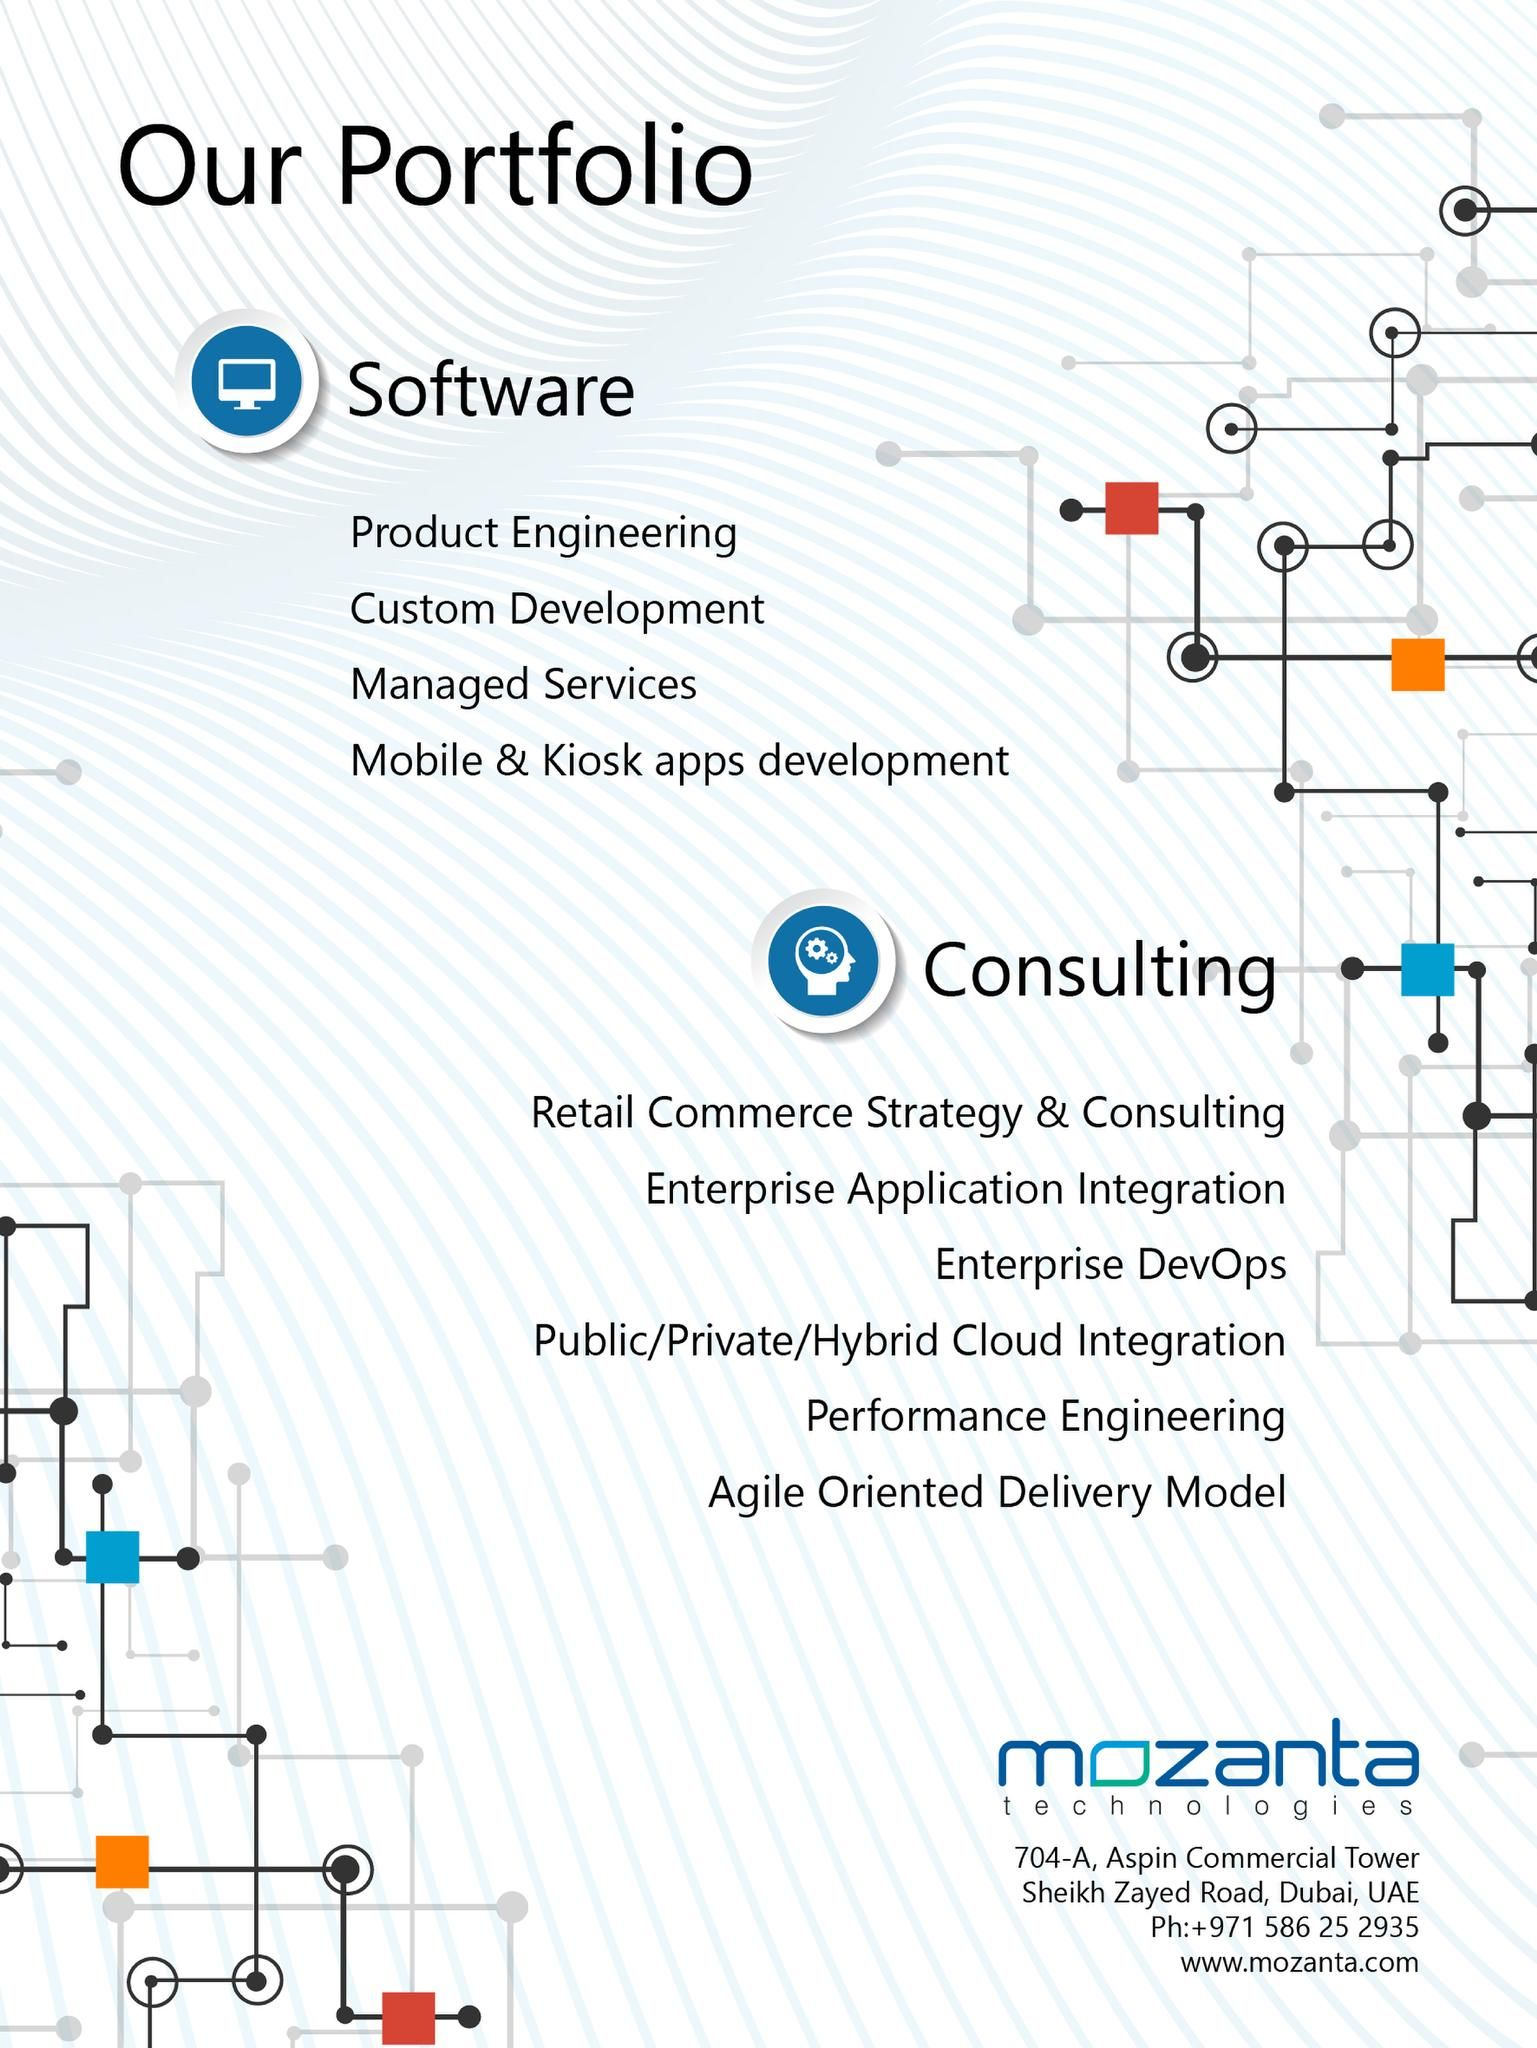 Mozanta Technologies LLC